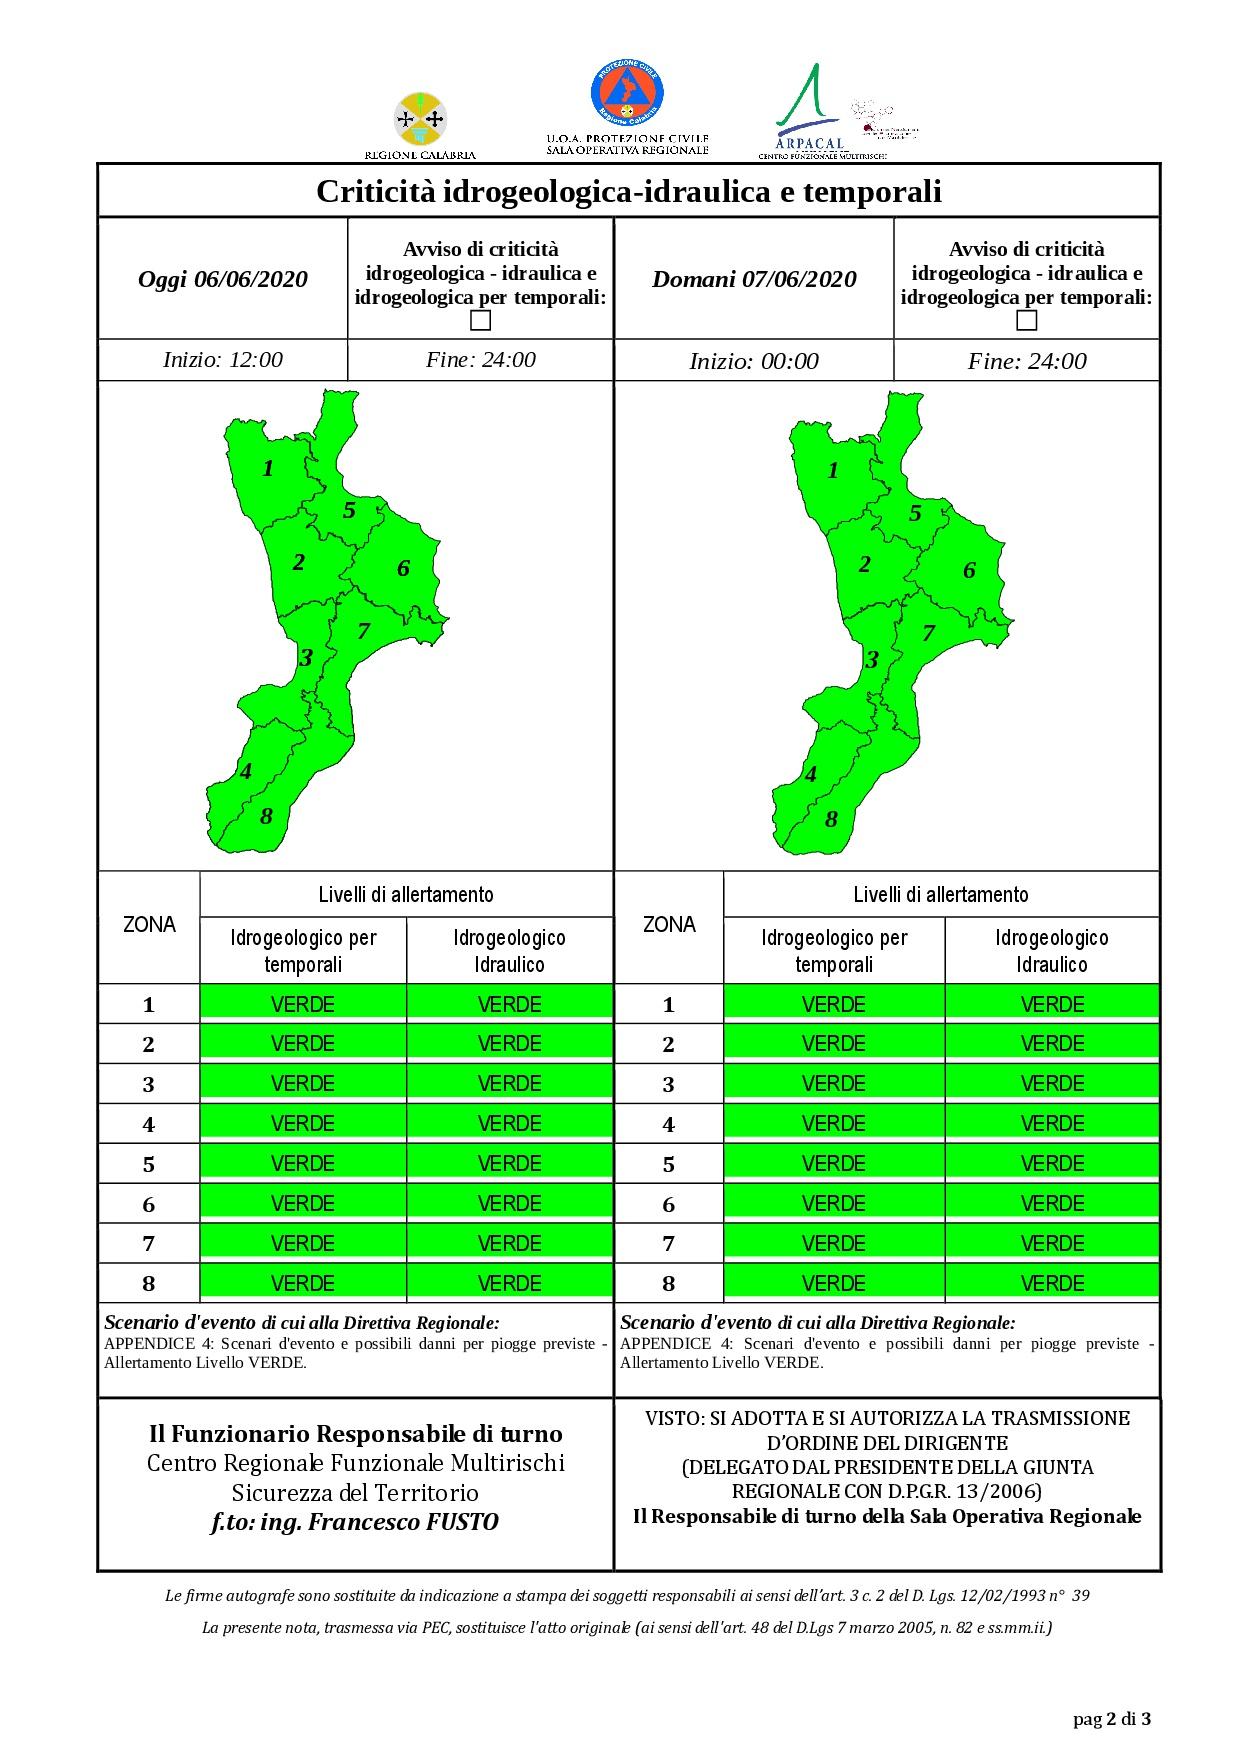 Criticità idrogeologica-idraulica e temporali in Calabria 06-06-2020